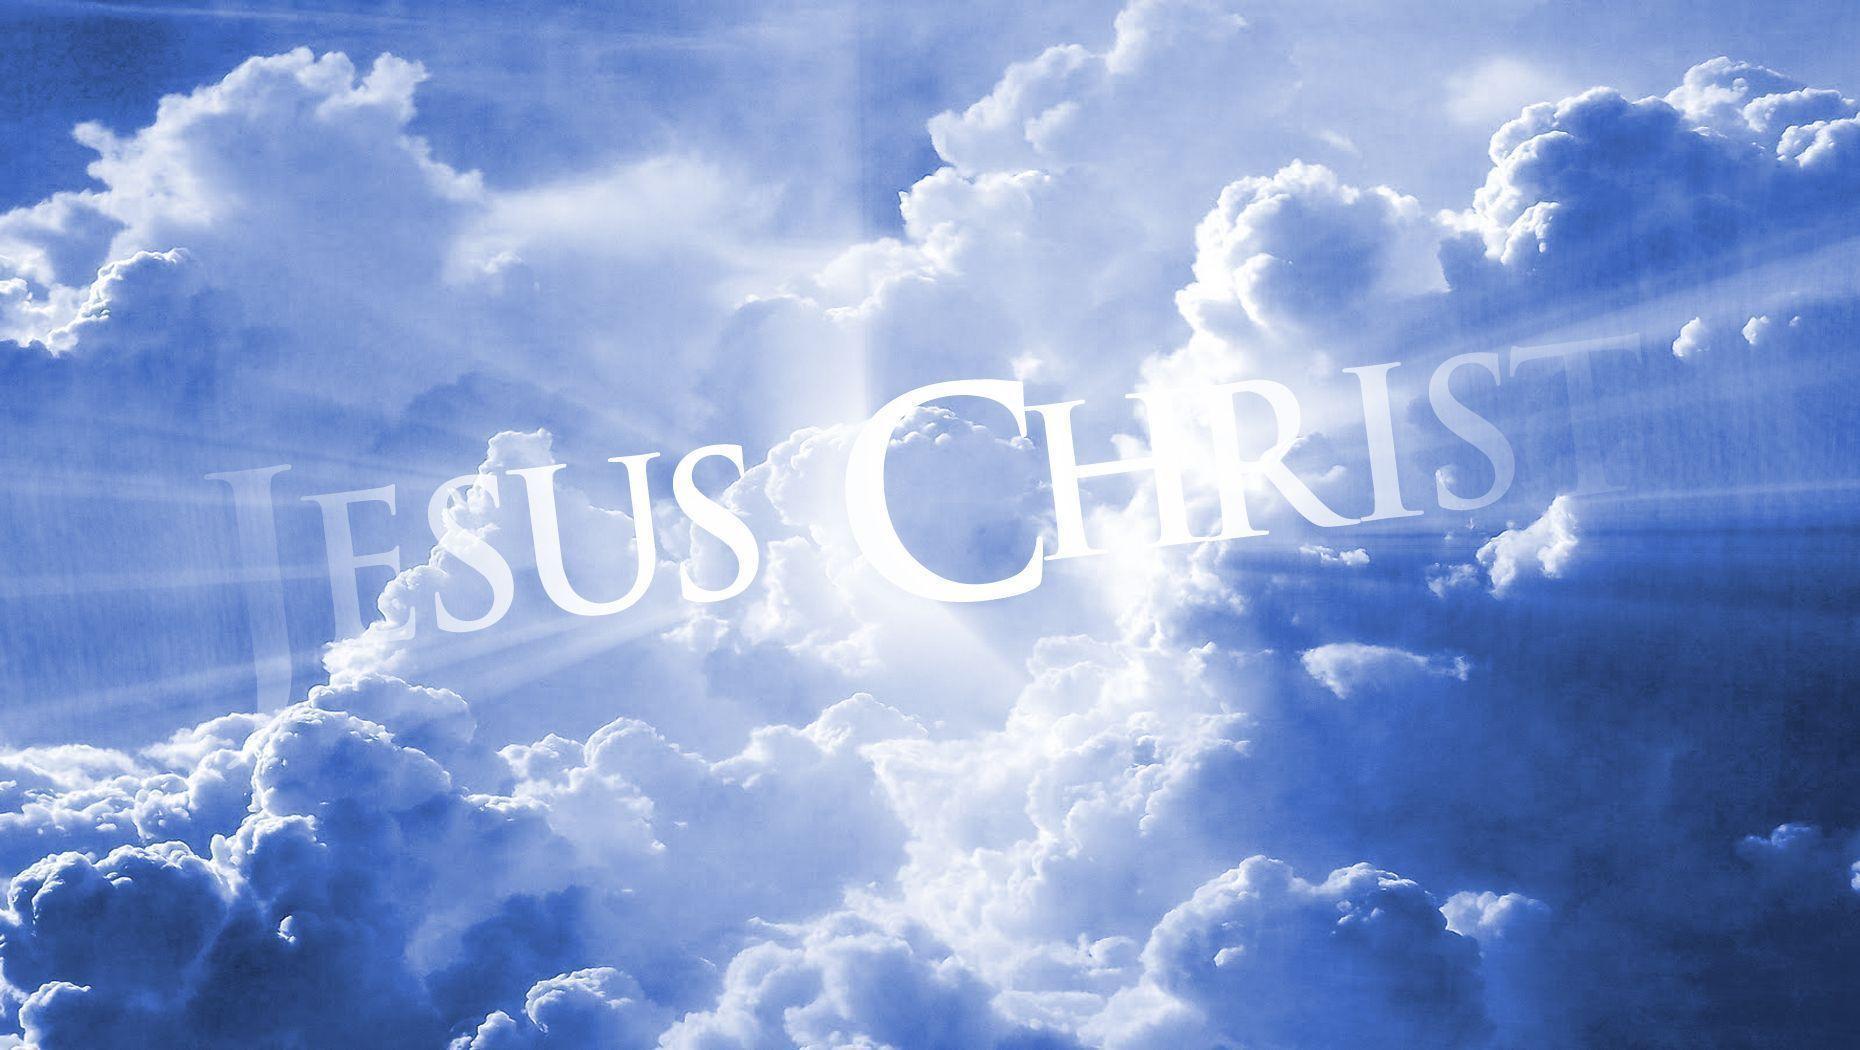 jesus resurrection wallpaper - photo #33